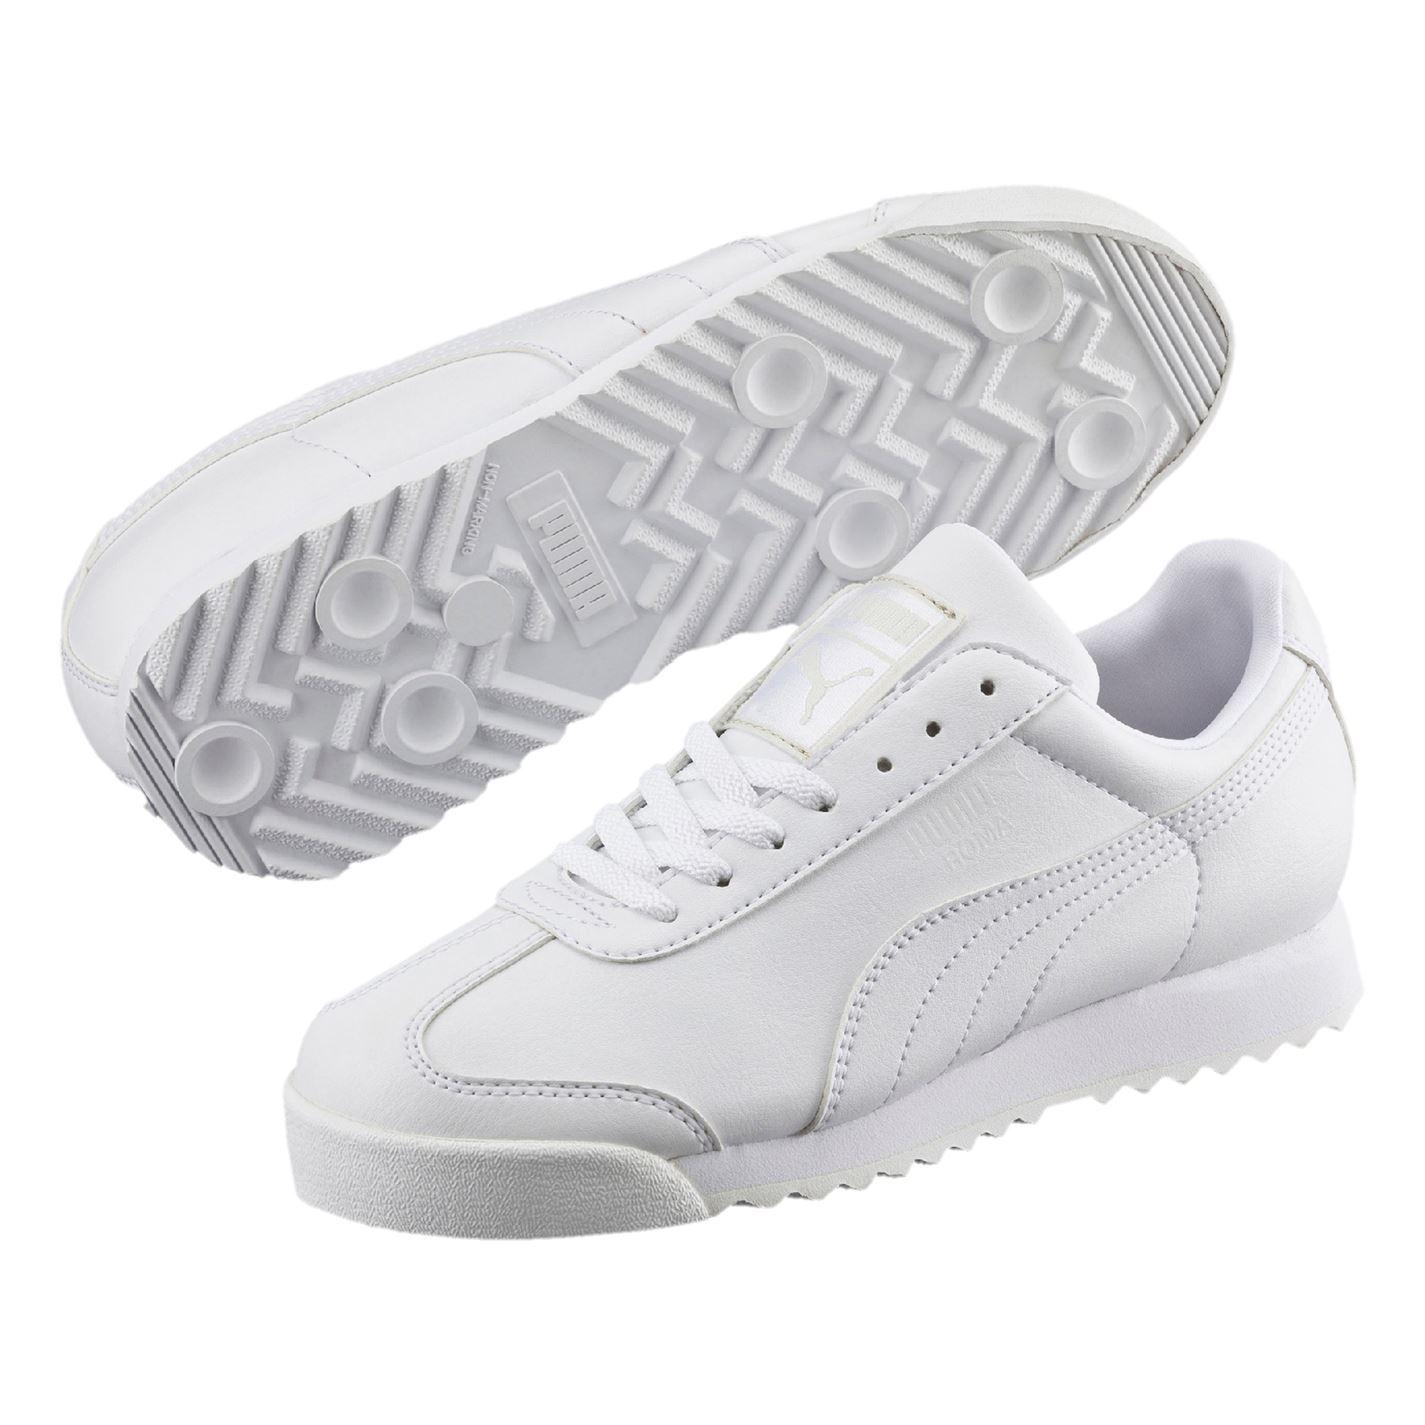 chaussures enfants garçon puma